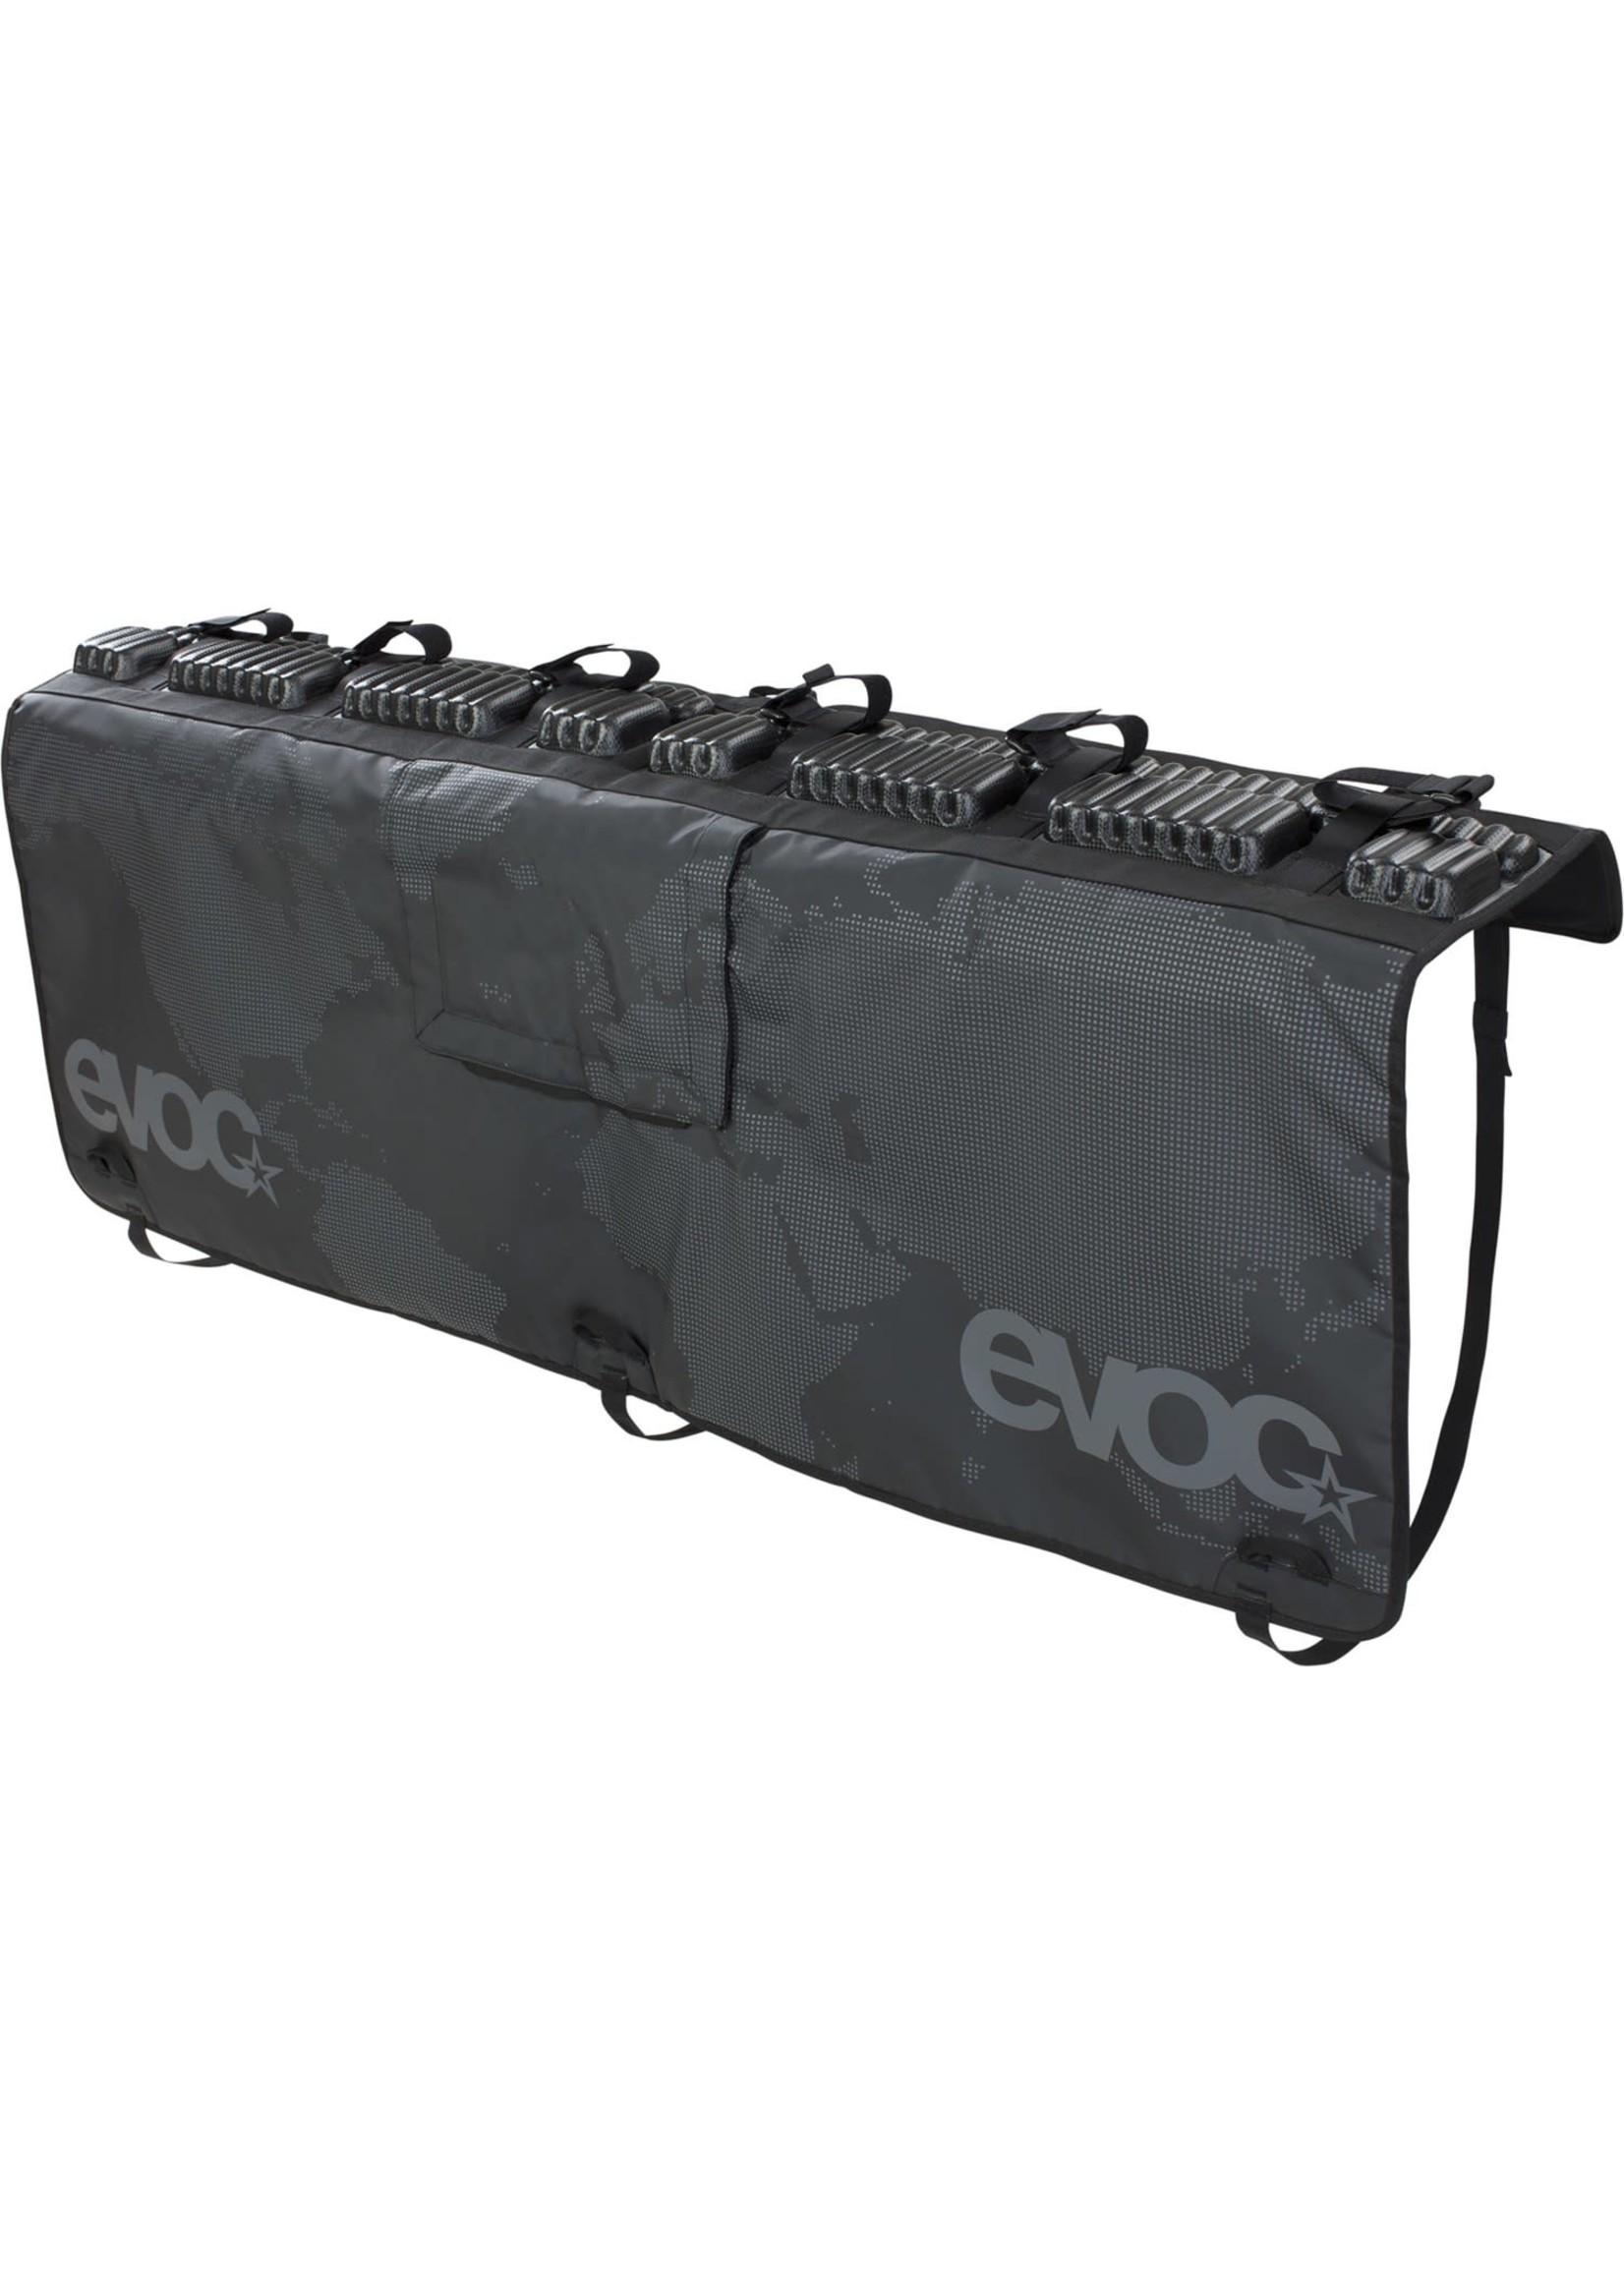 Evoc EVC, Tailgate pad, Black, XL (160x100x2cm)